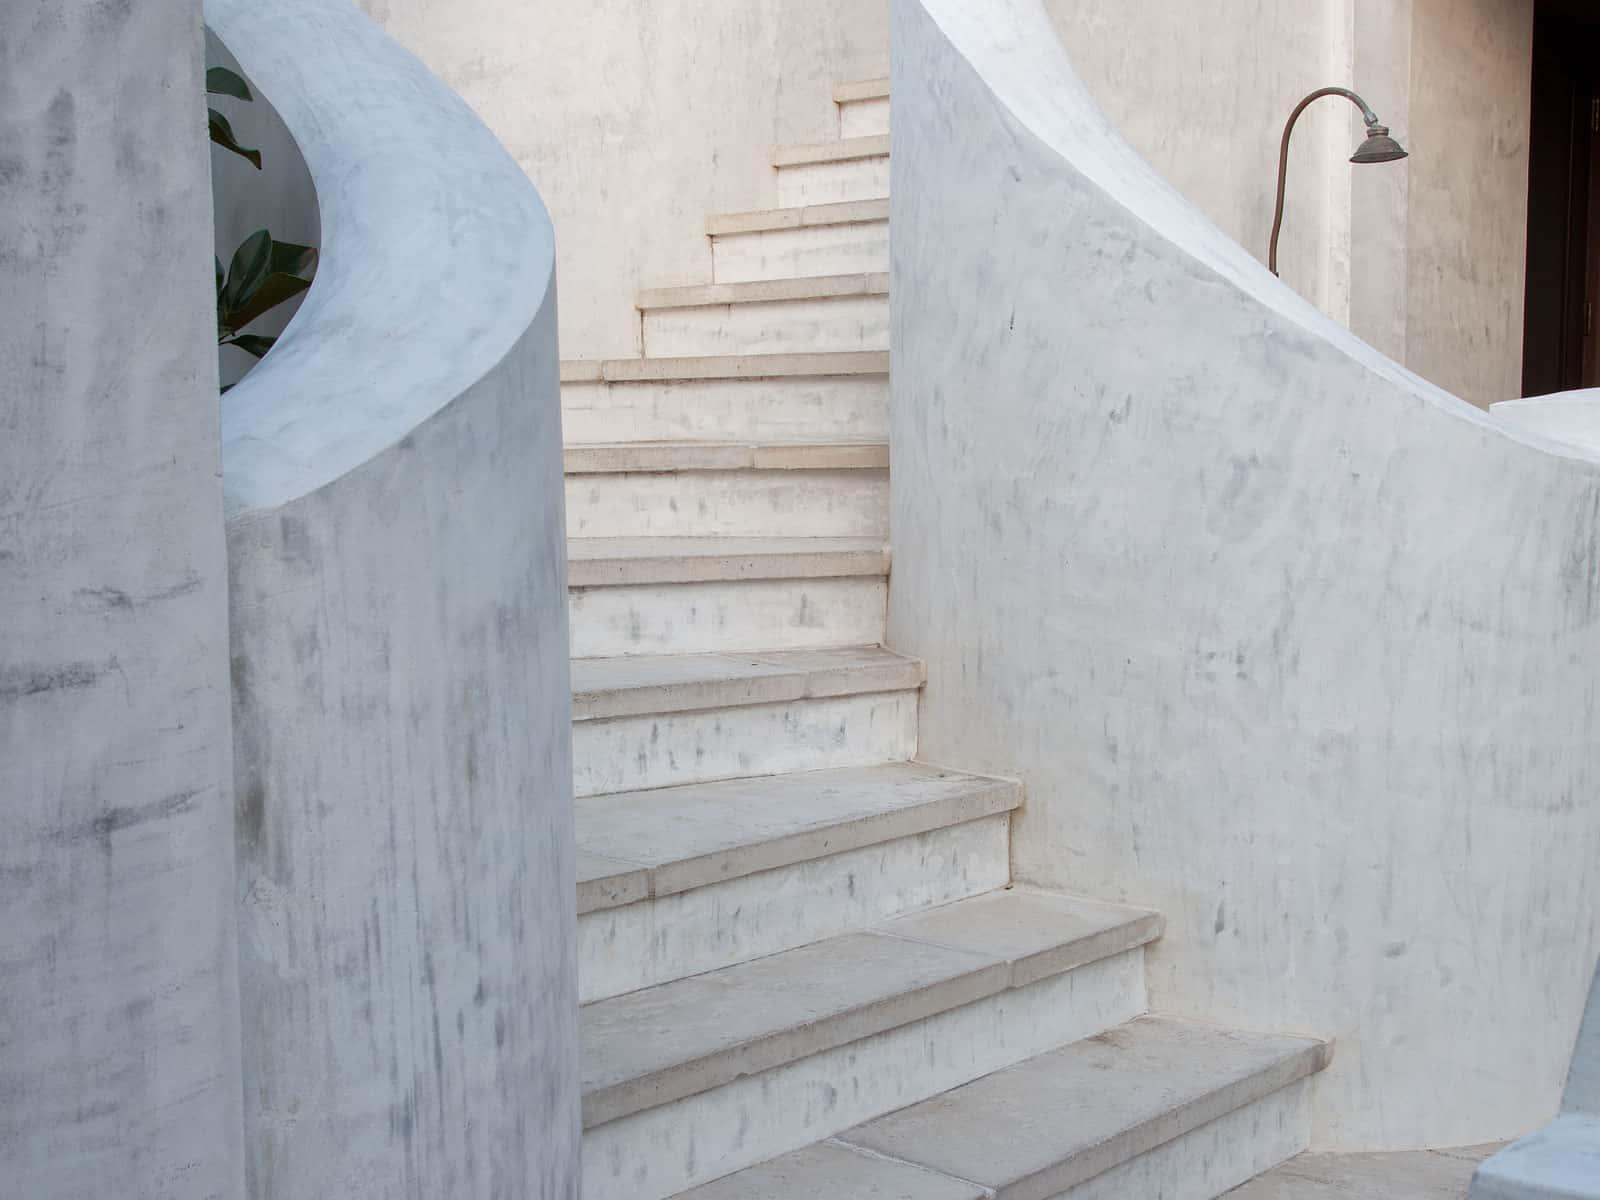 Stairway concrete pavers